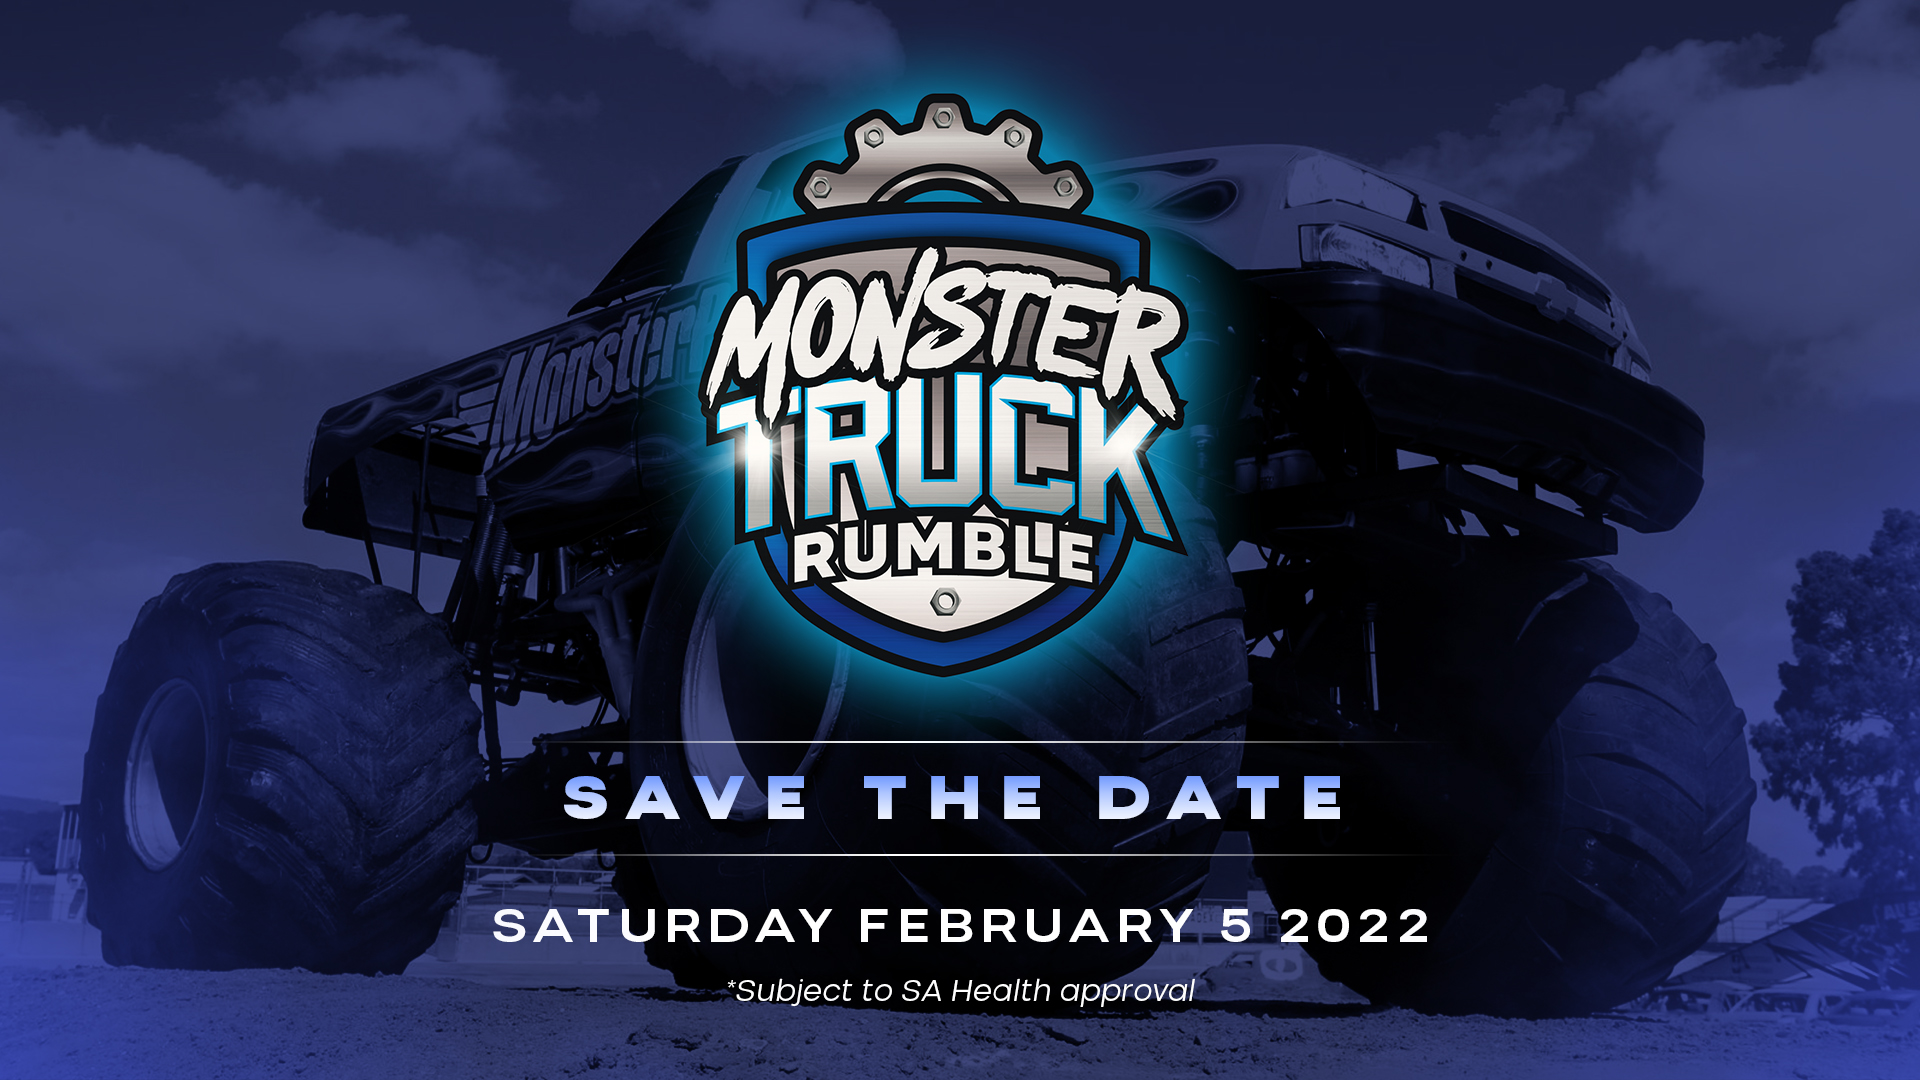 Monster Truck Rumble SAT FEB 5, 2022